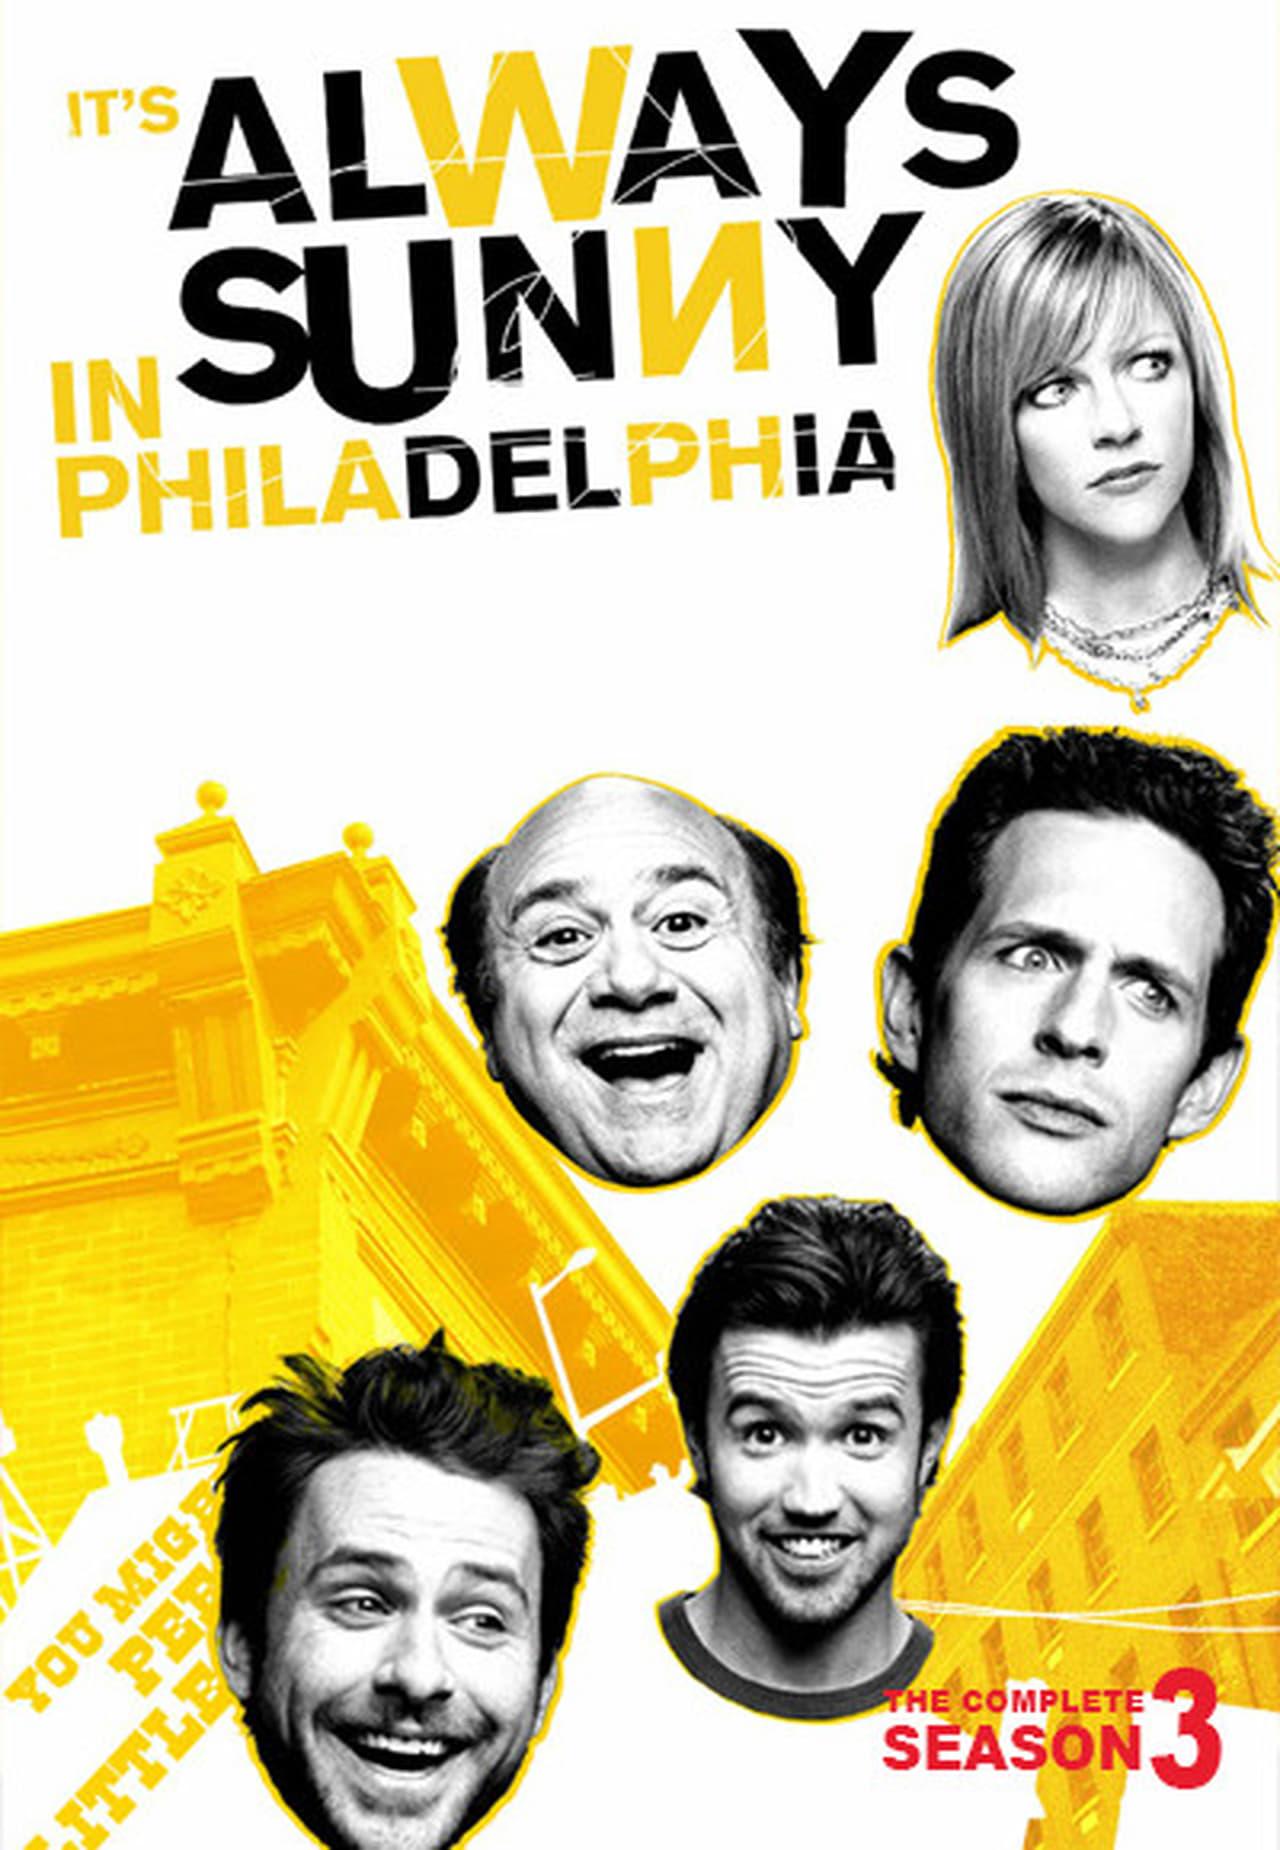 Putlocker It's Always Sunny In Philadelphia Season 3 (2007)